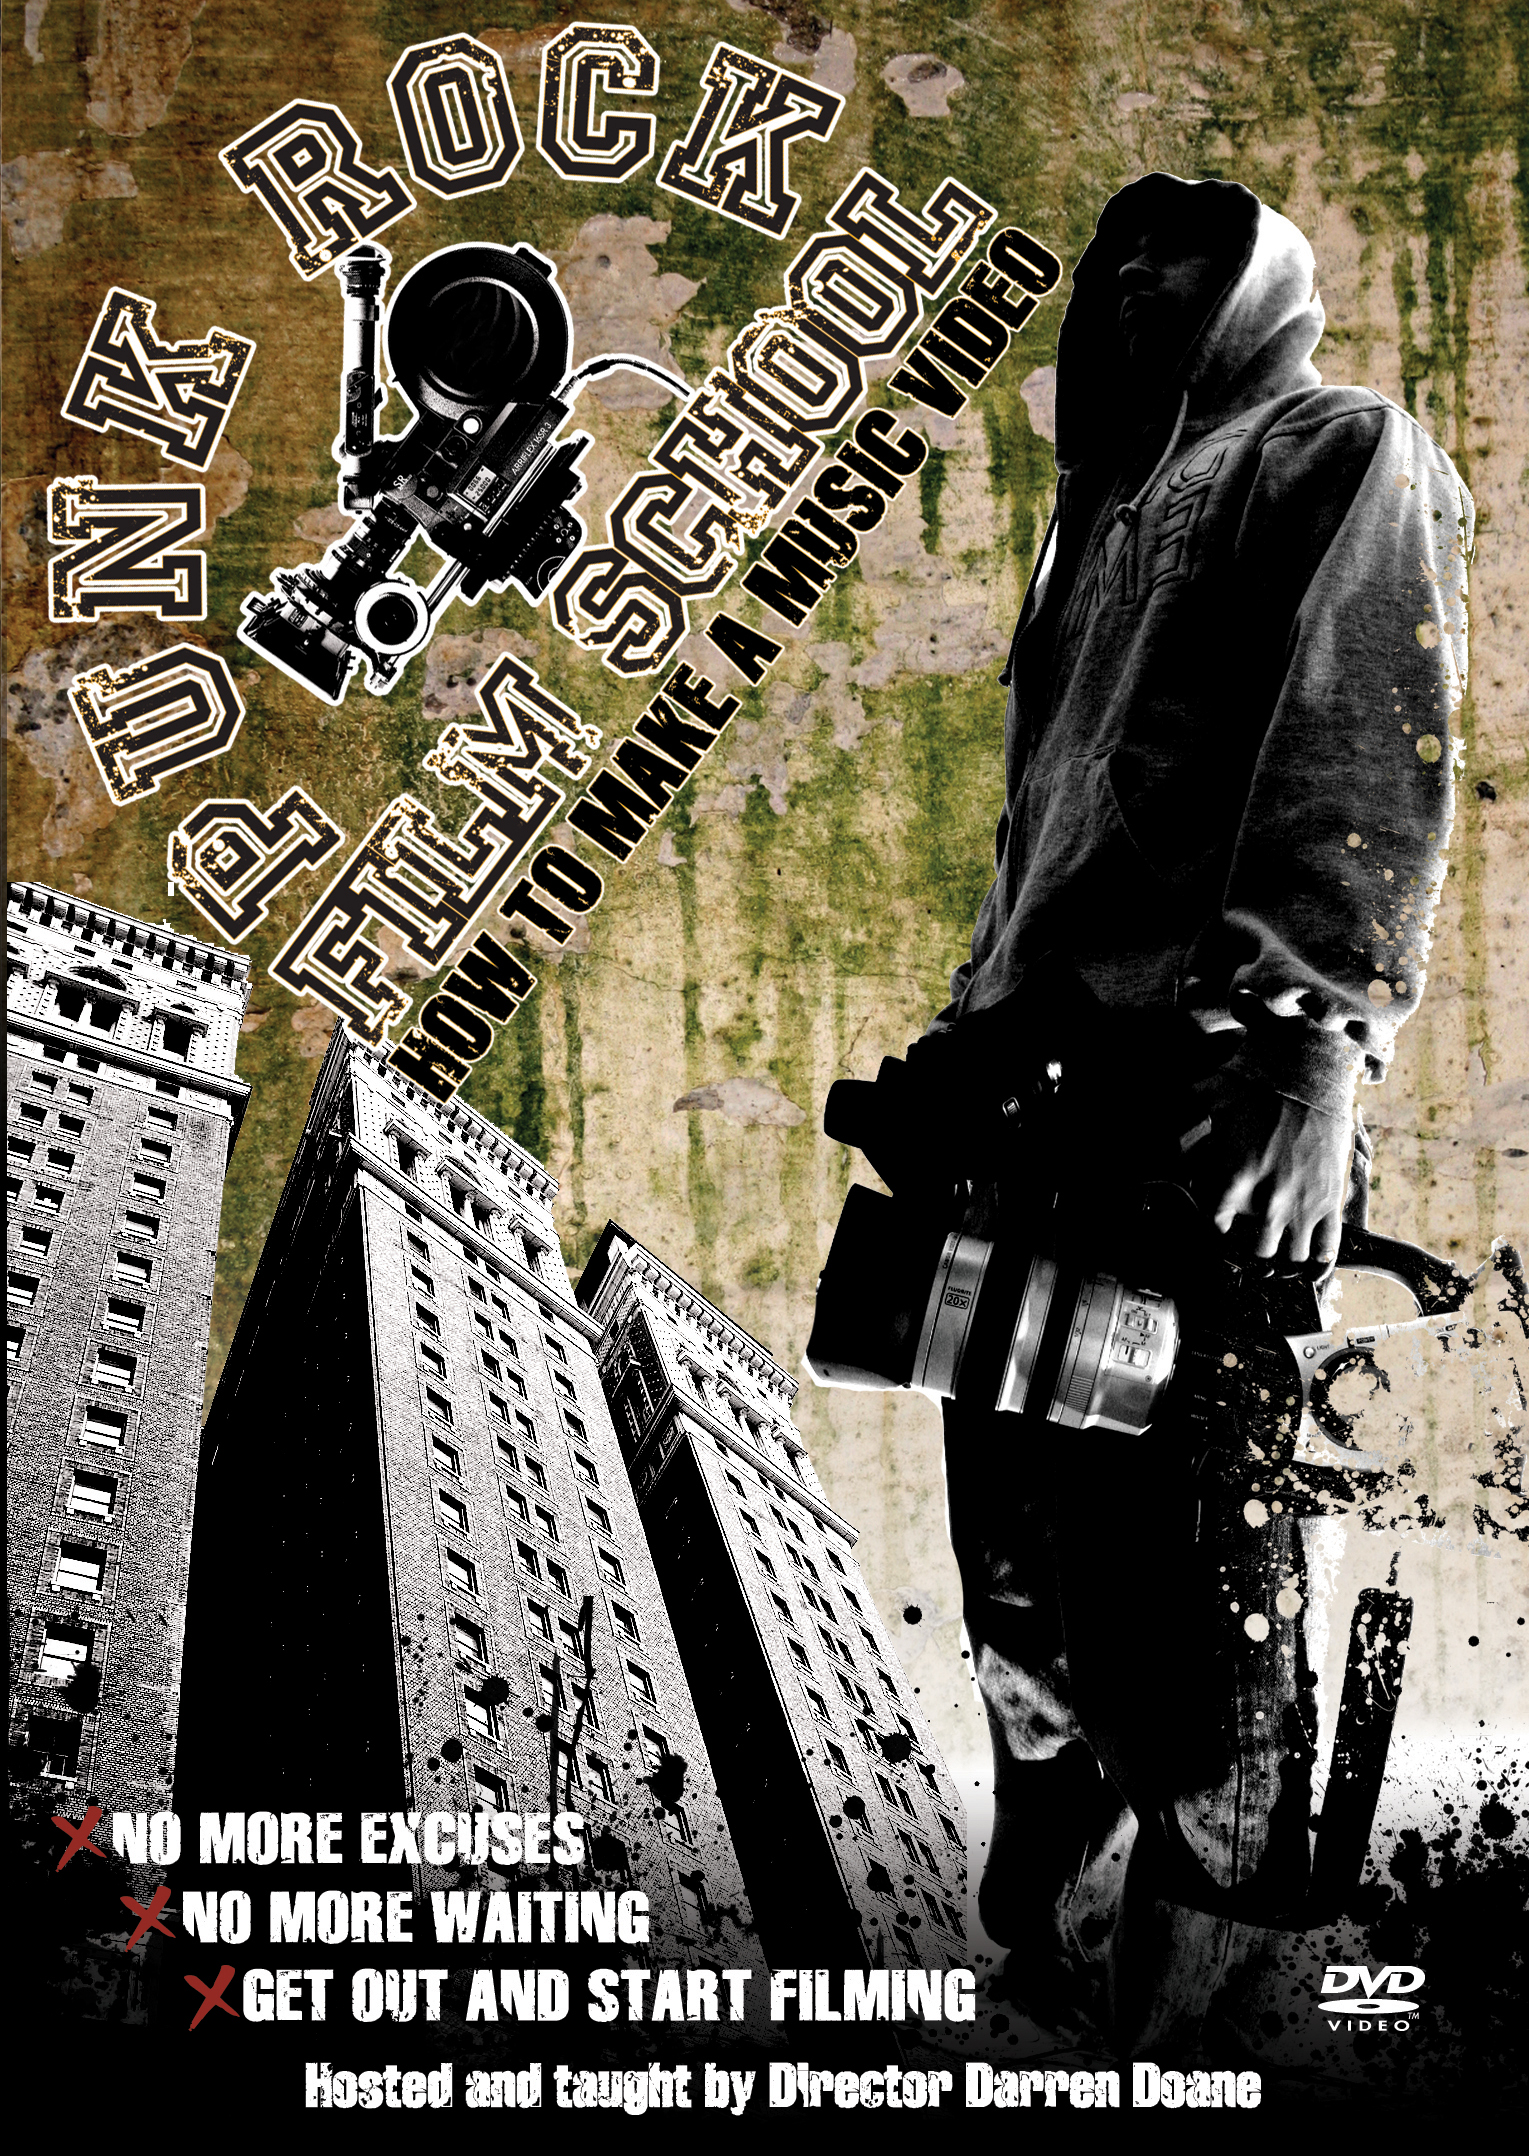 Punk Rock Film School